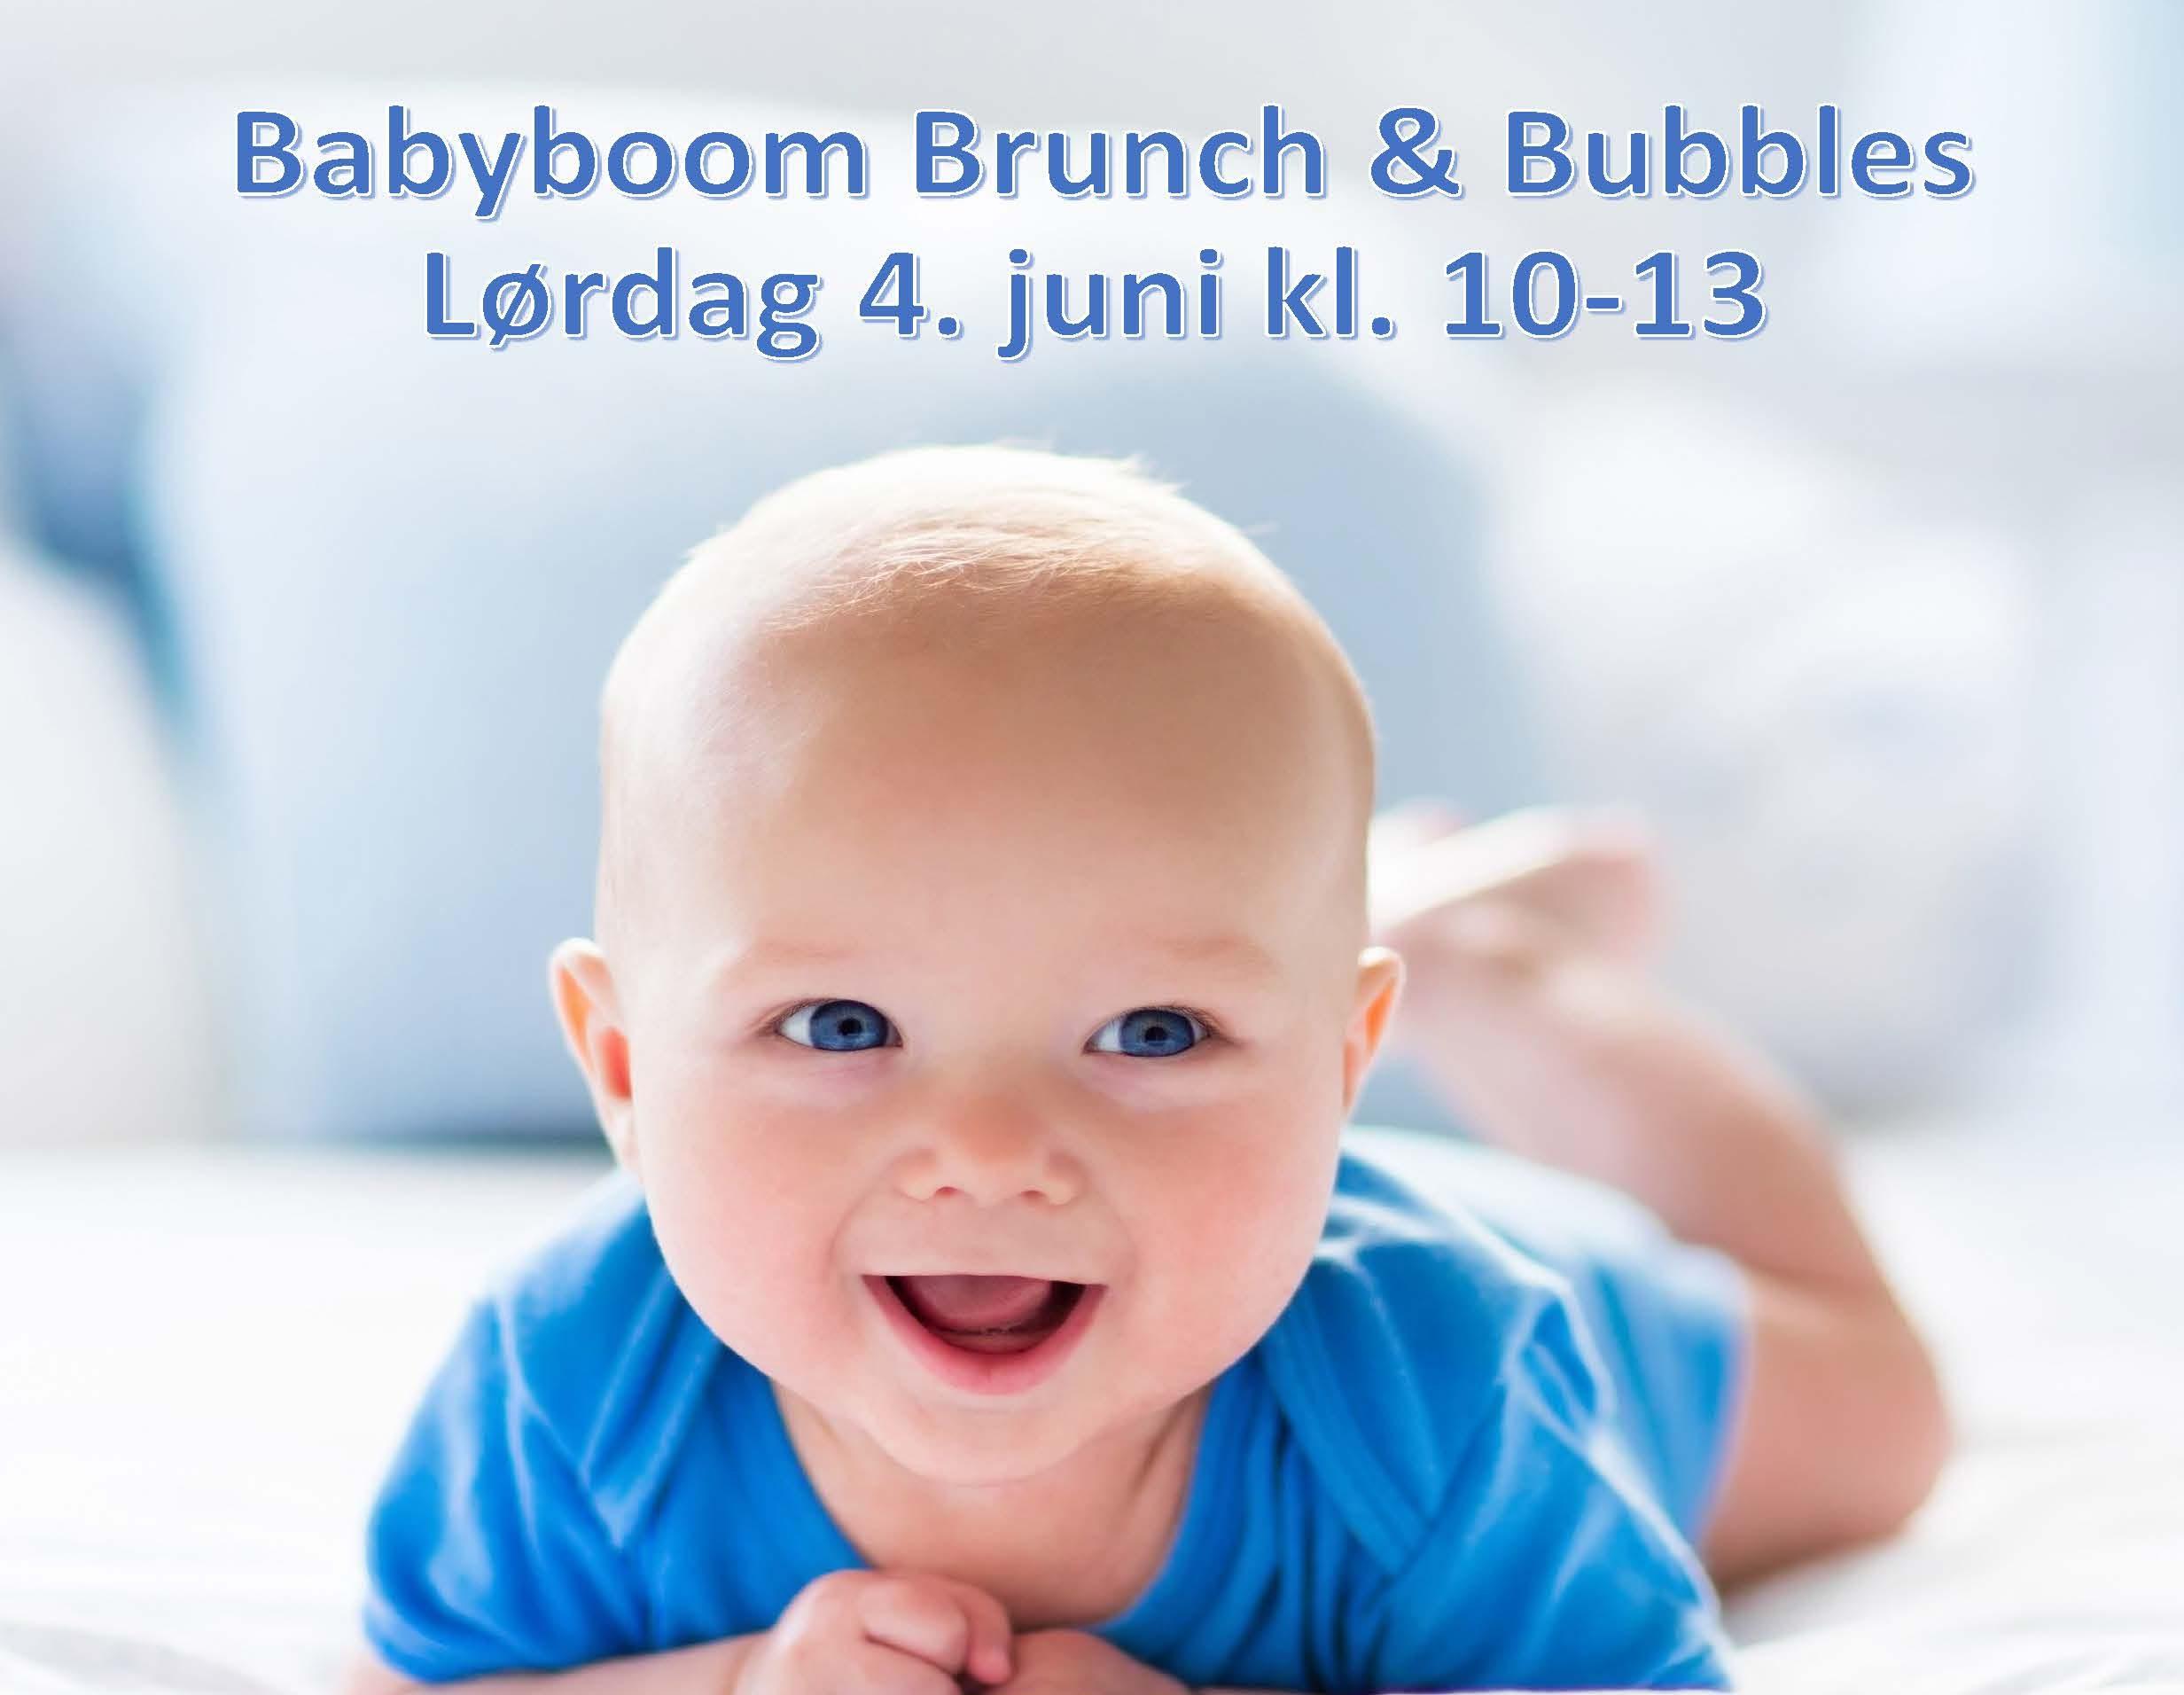 Baby Boom & Bubbles